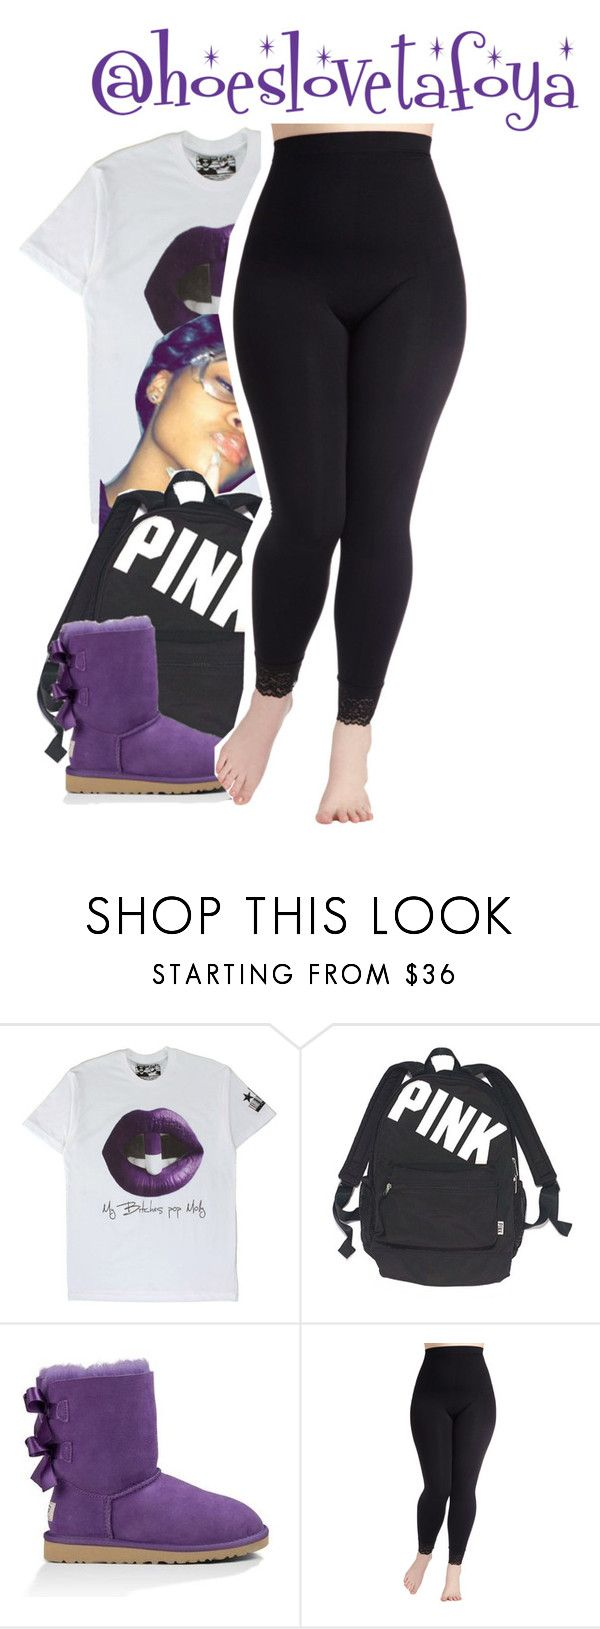 """Bts pt10"" by hoeslovetafoya ❤ liked on Polyvore featuring Victoria's Secret, UGG Australia and plus size clothing"